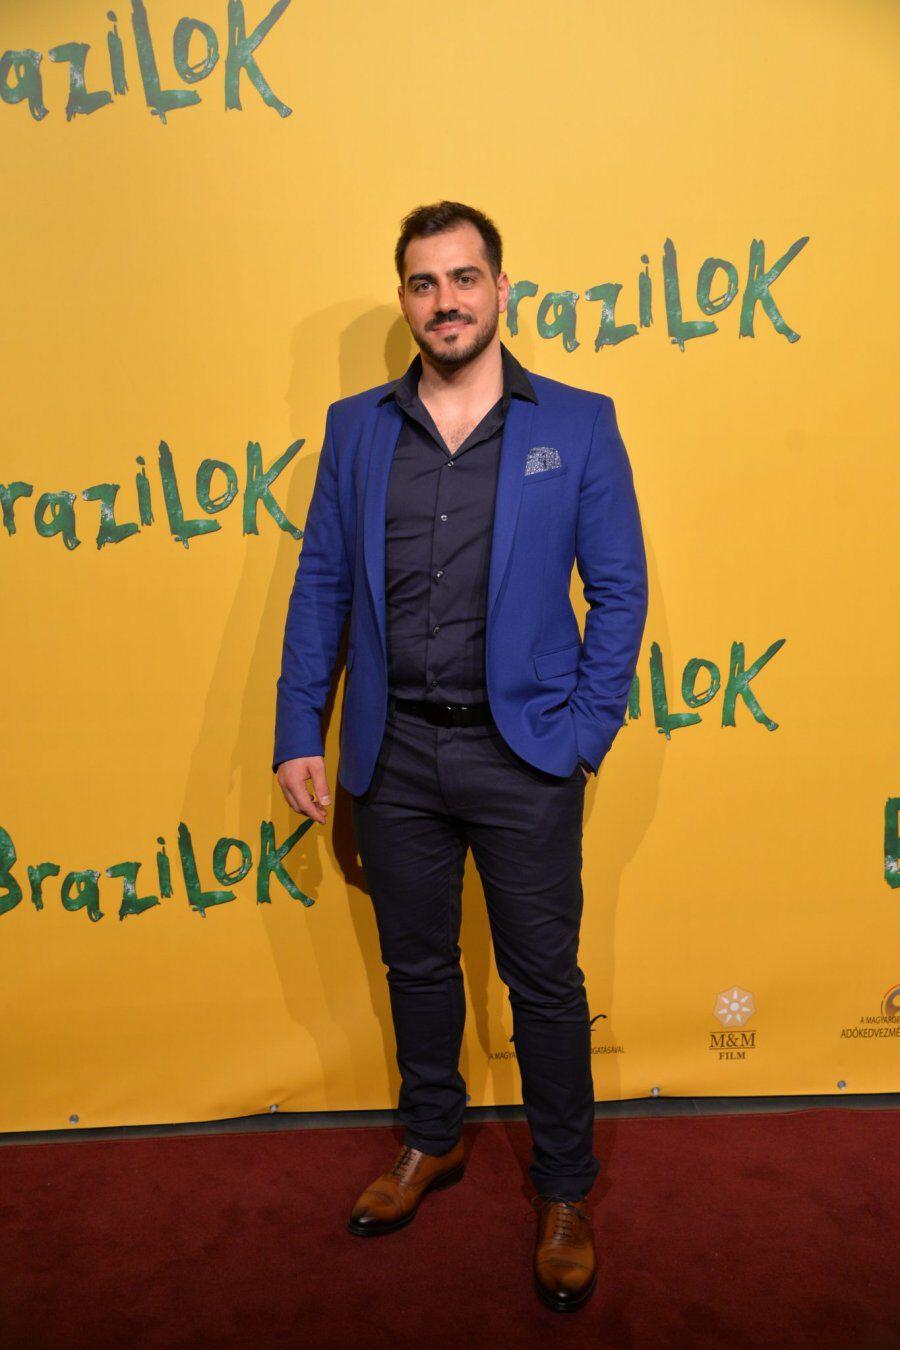 Dani Brazilok Premier E1501608653399